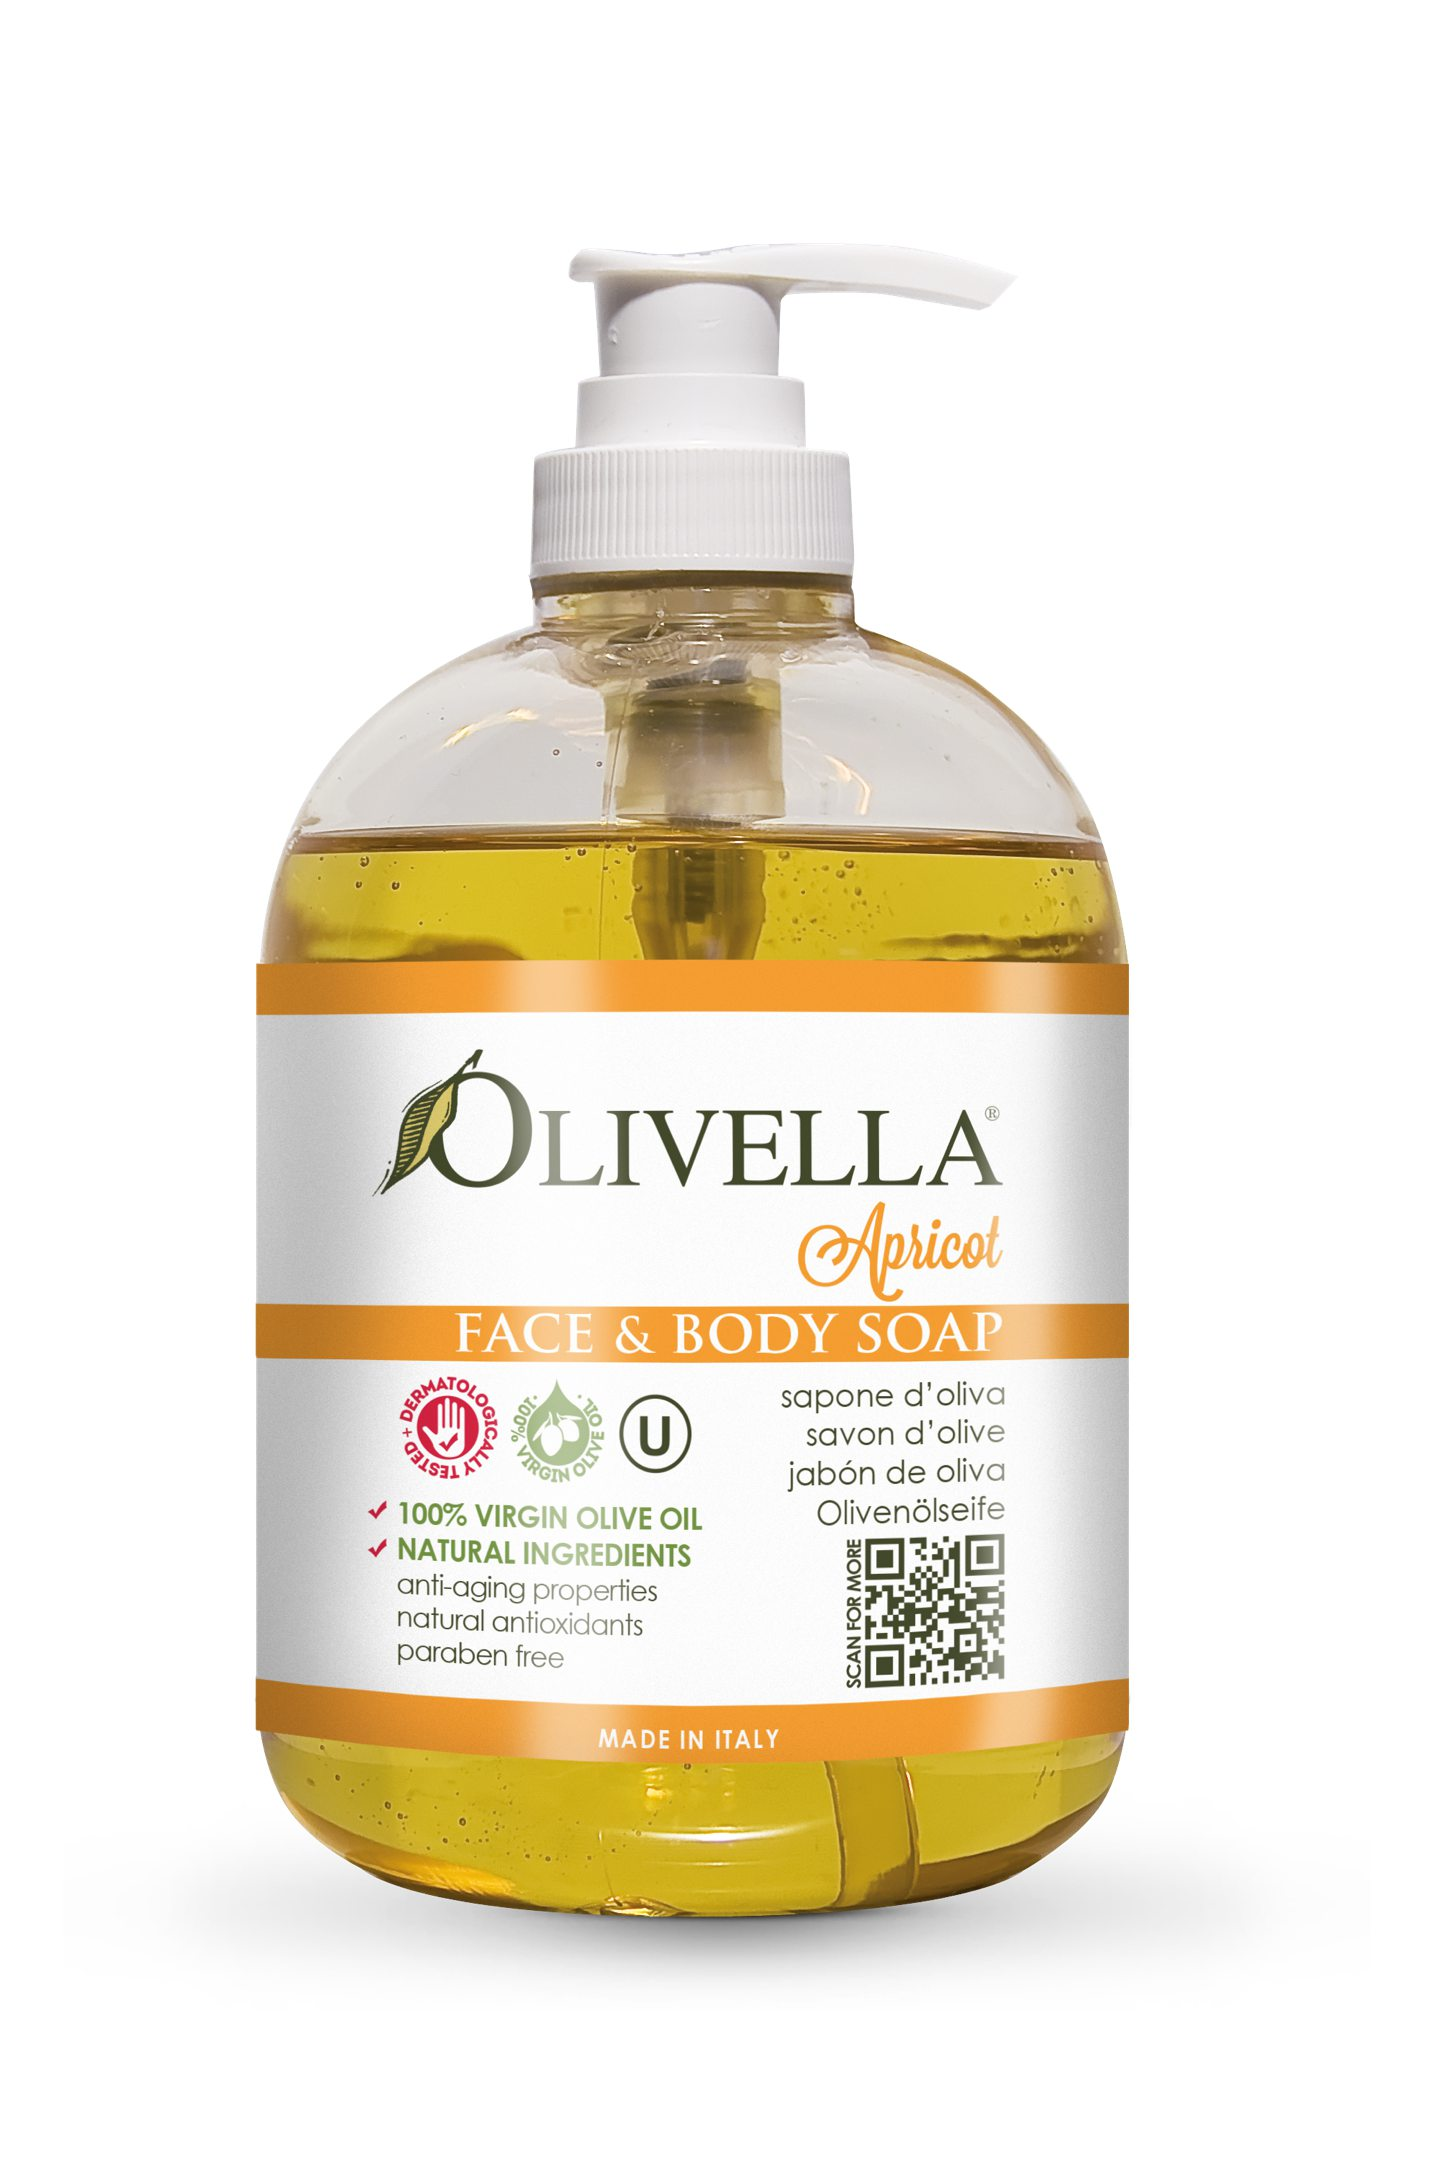 Olivella Face & Body Liquid Soap Pump - Apricot